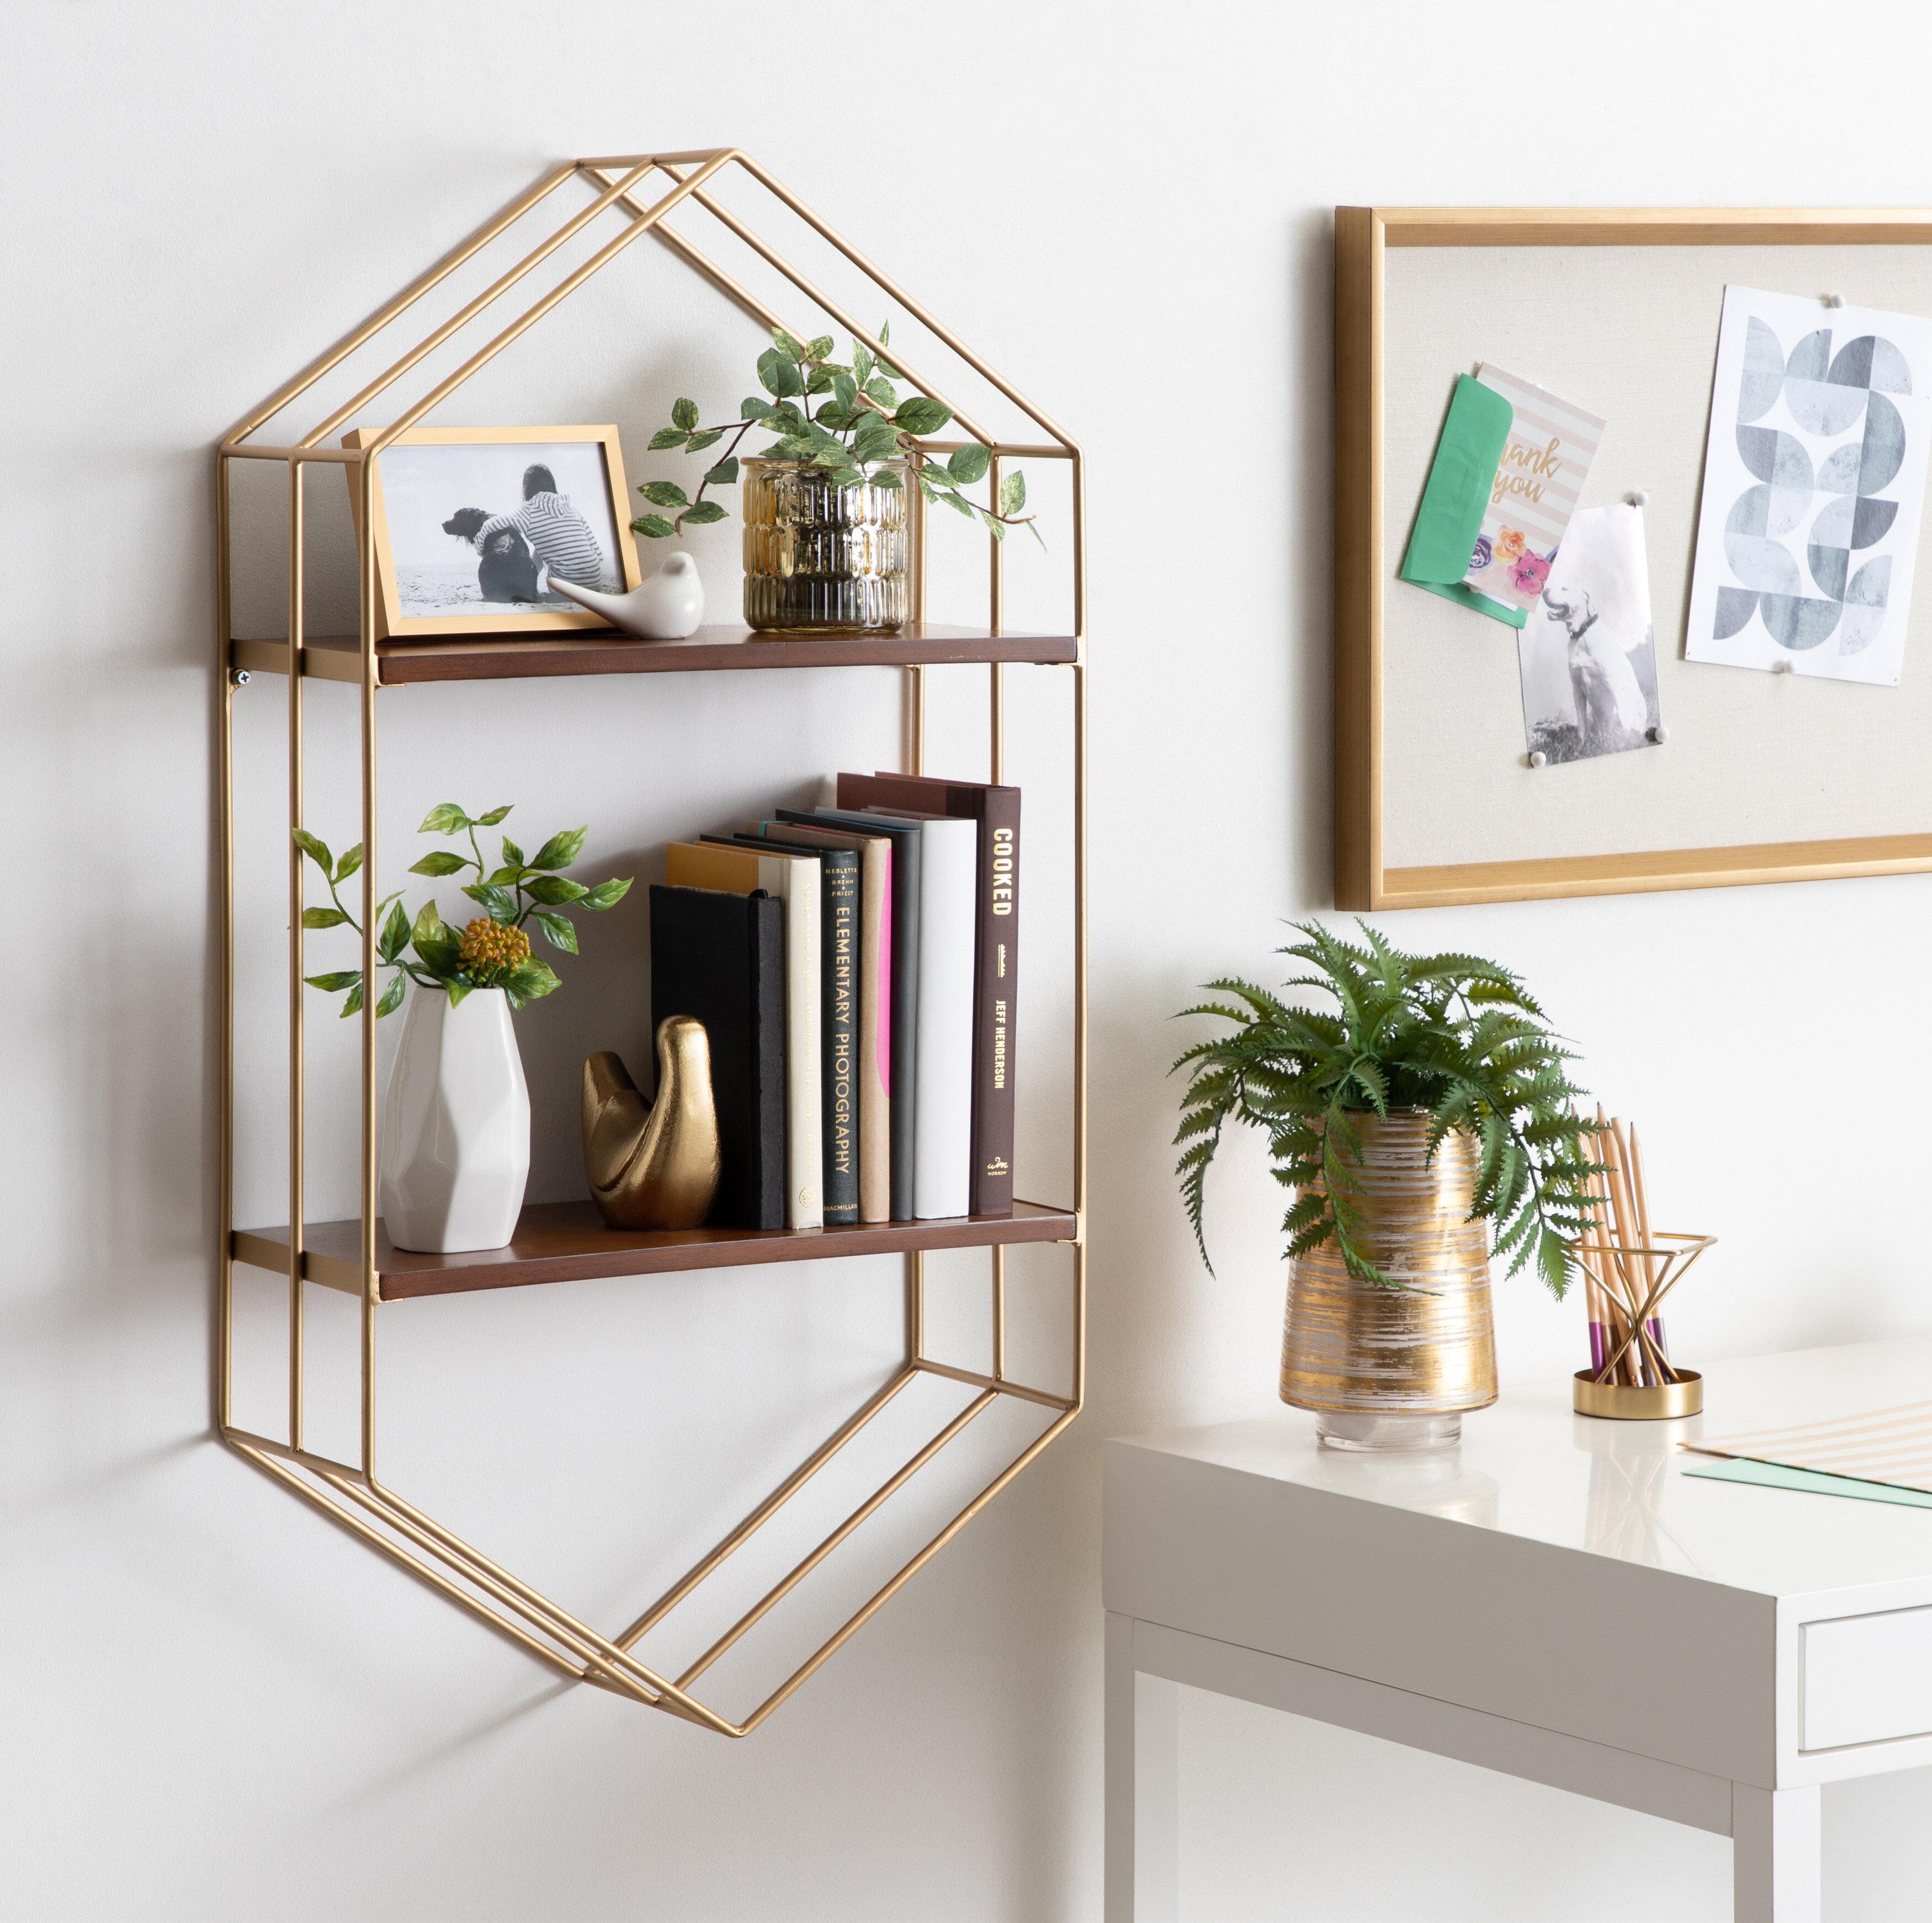 Wayfair Bedroom Wall Display Shelves You Ll Love In 2021